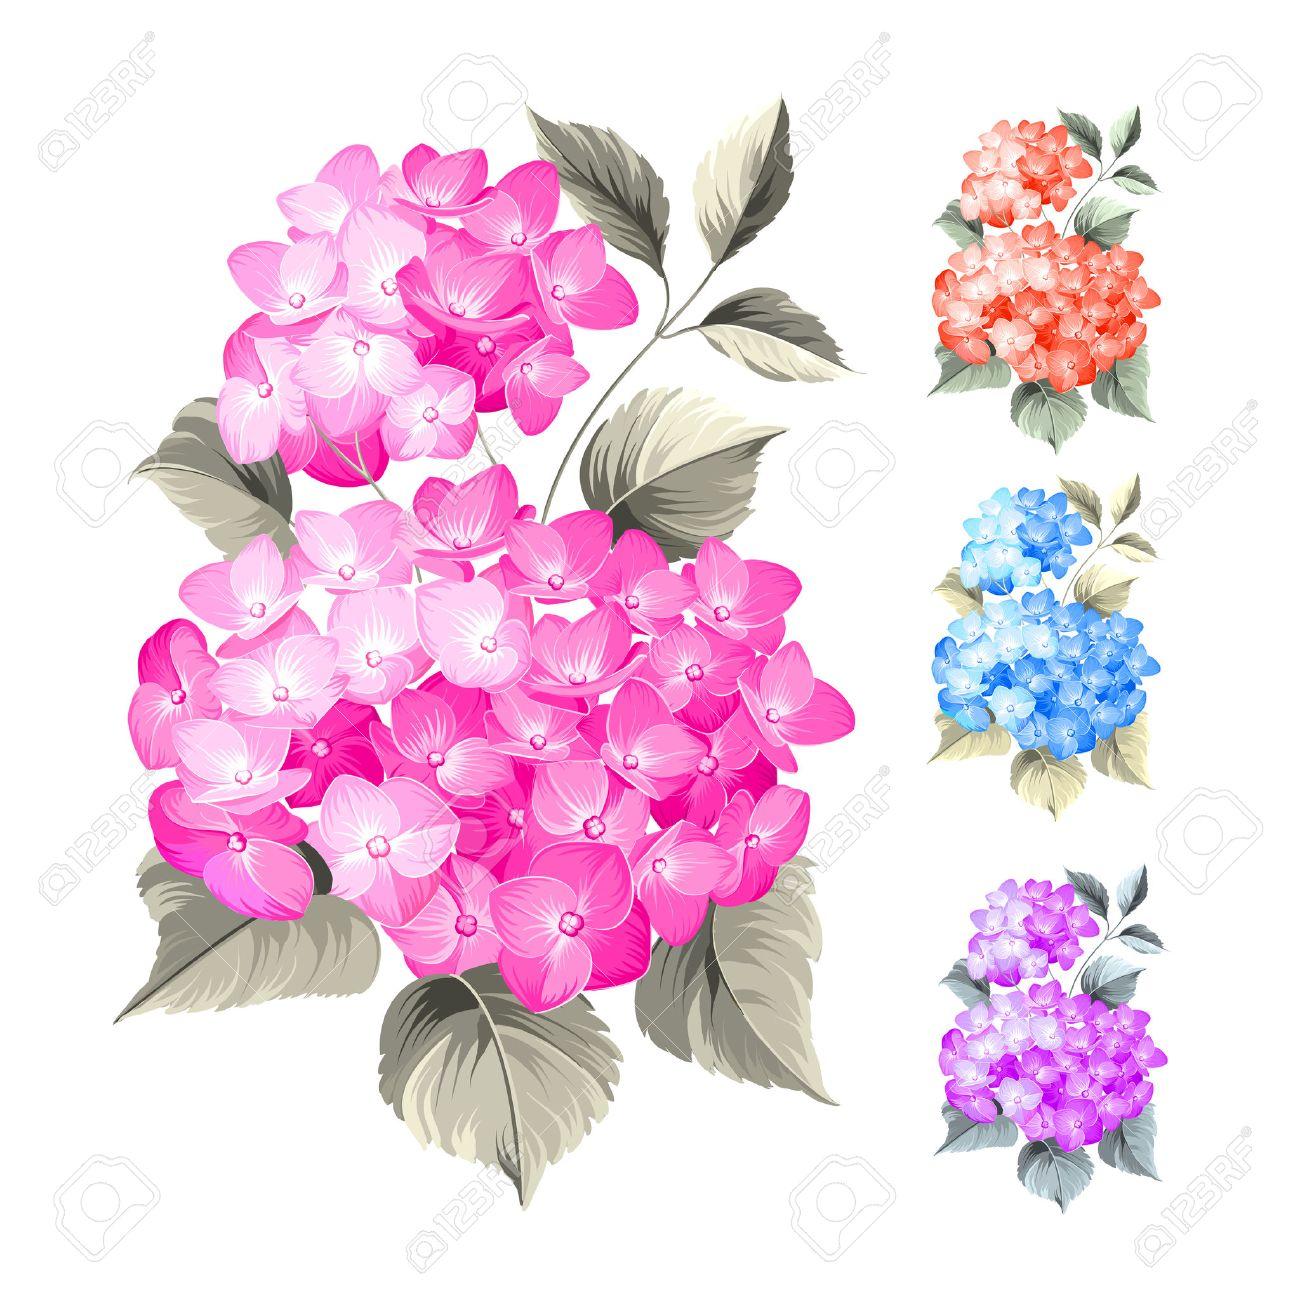 Fleur Hortensia Sur Fond Blanc Tete De Balai Fleur D Hortensia